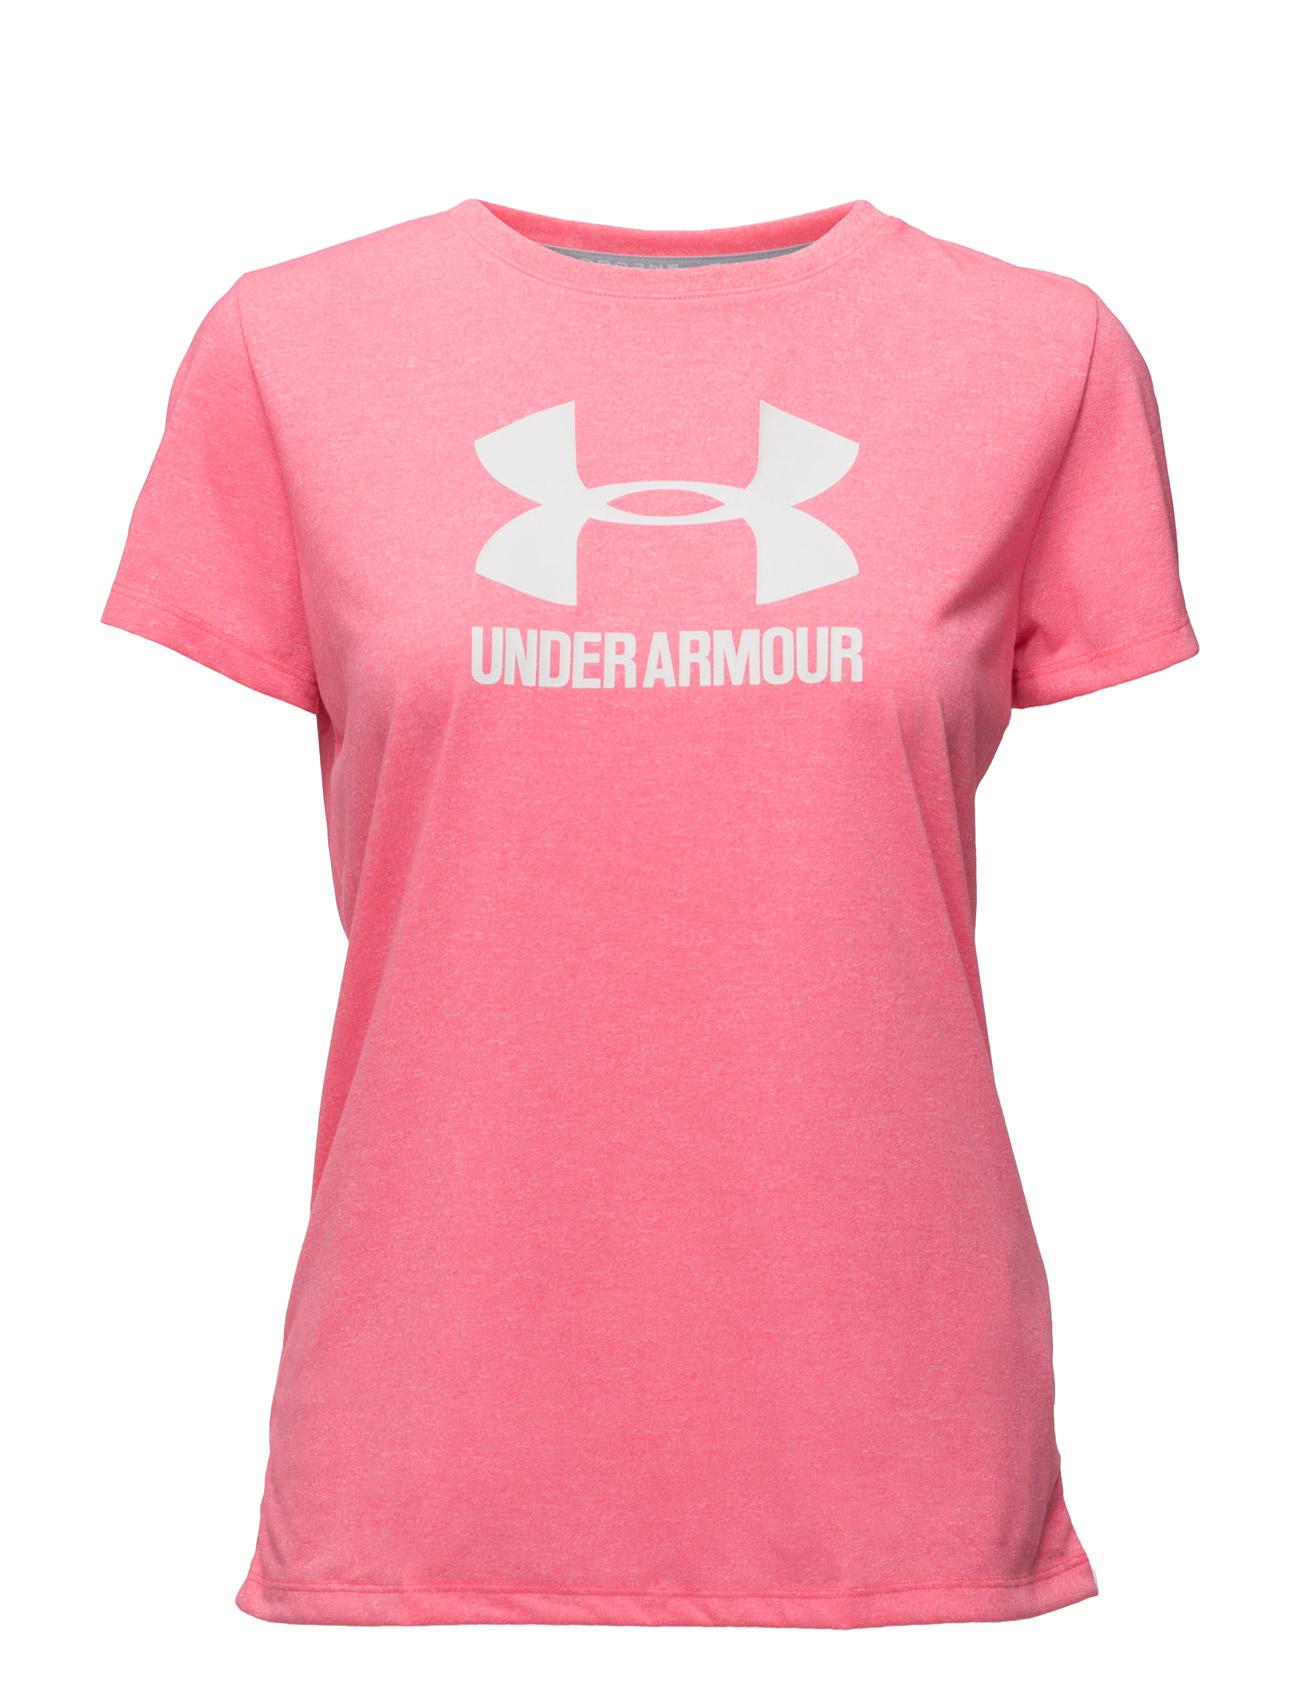 Threadborne Trn Sprt Ssc Tw Under Armour Løbe t-shirts til Damer i